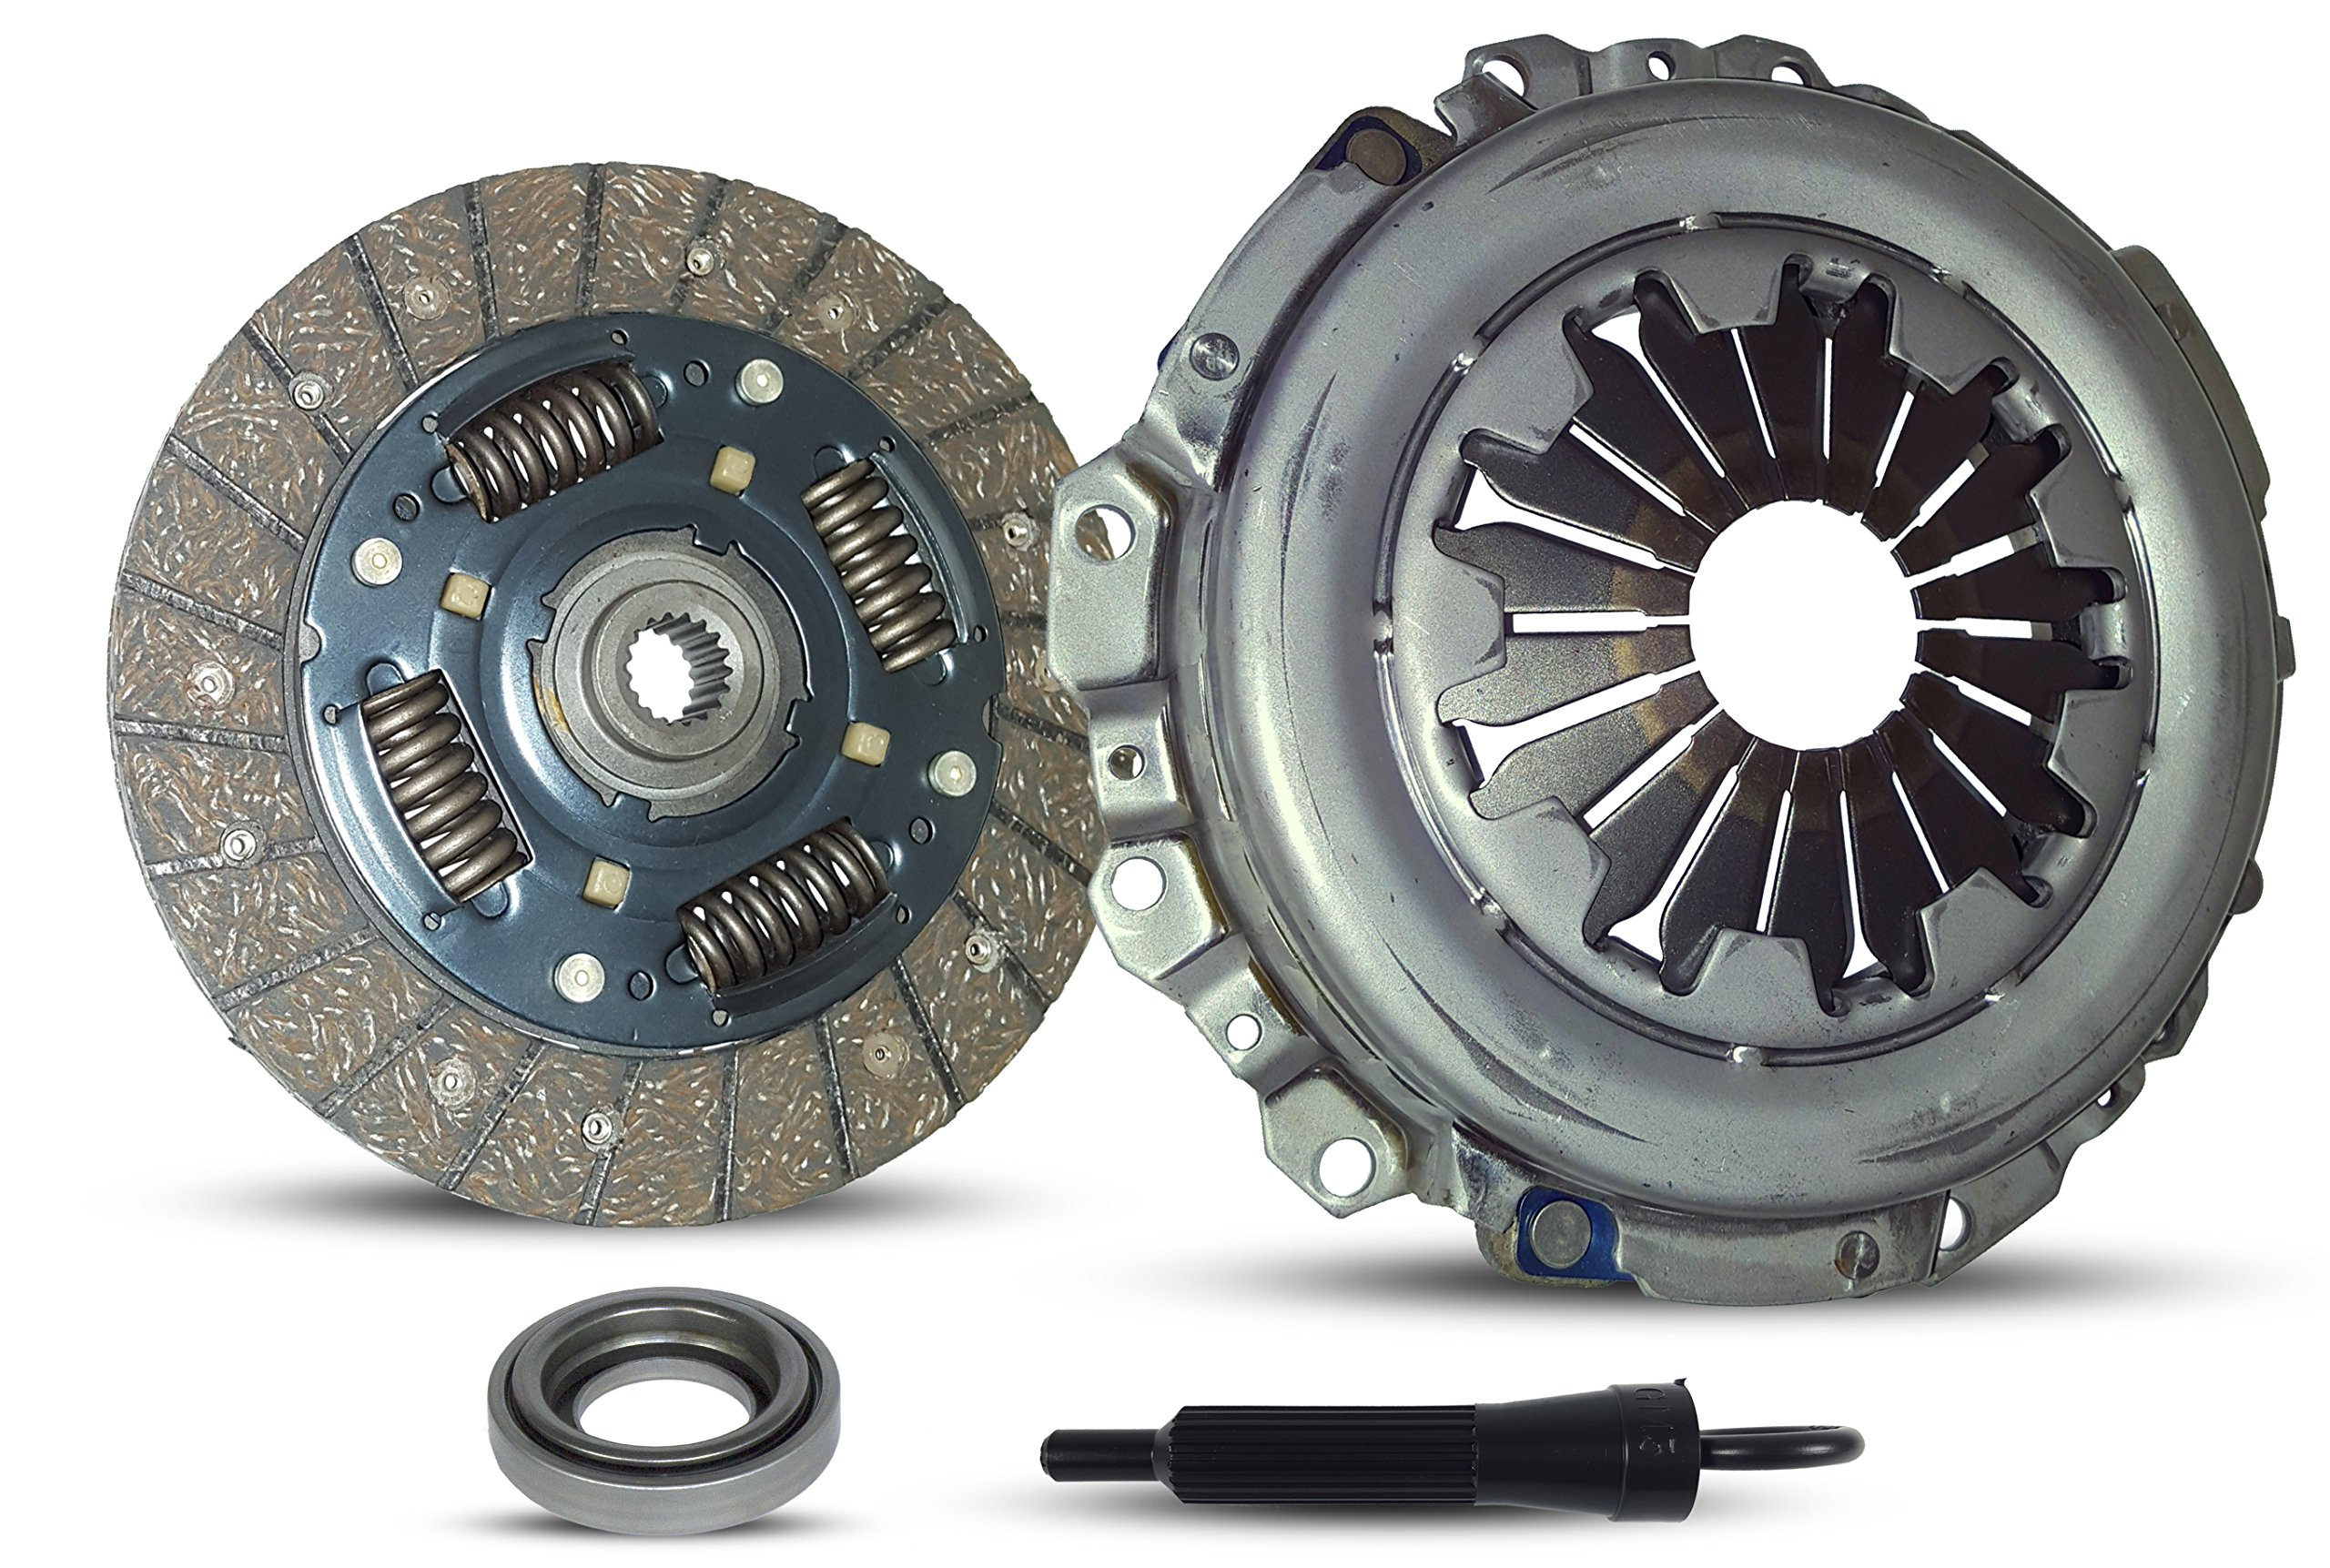 Clutch Kit Works With Set Pontiac Matiz Chevy Spark Byte Cargo DOT LS LT LTZ DOT ZMX Base Hatchback 2011-2015 1.2L l4 GAS DOHC Naturally Aspirated